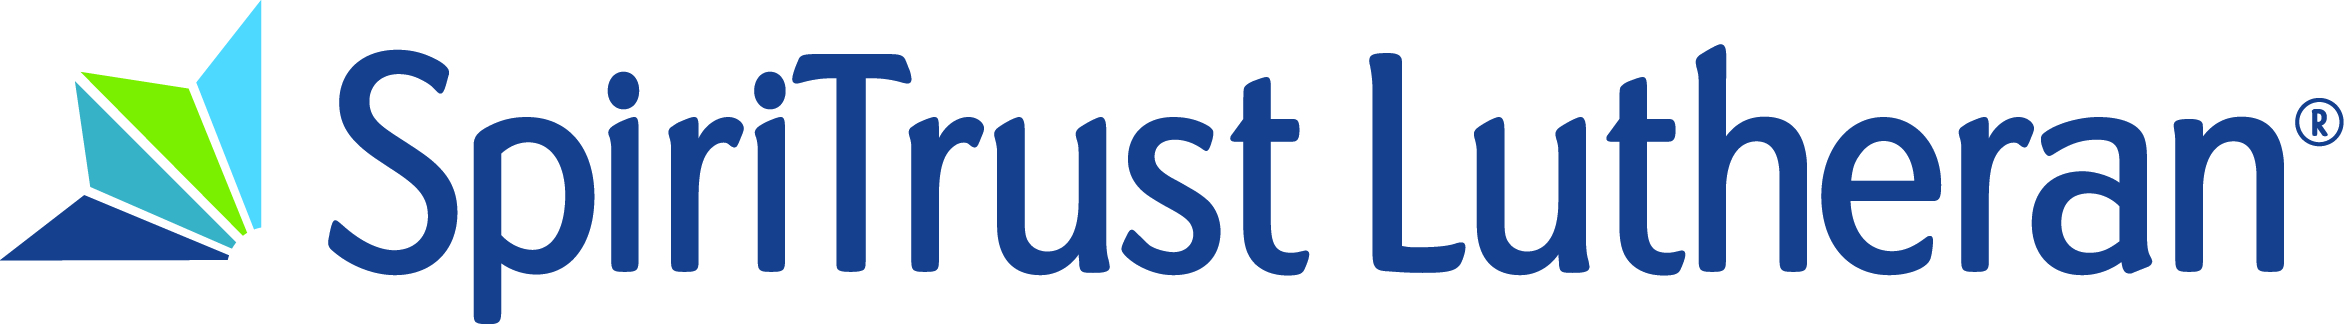 SpiriTrust Lutheran® | Career Listings